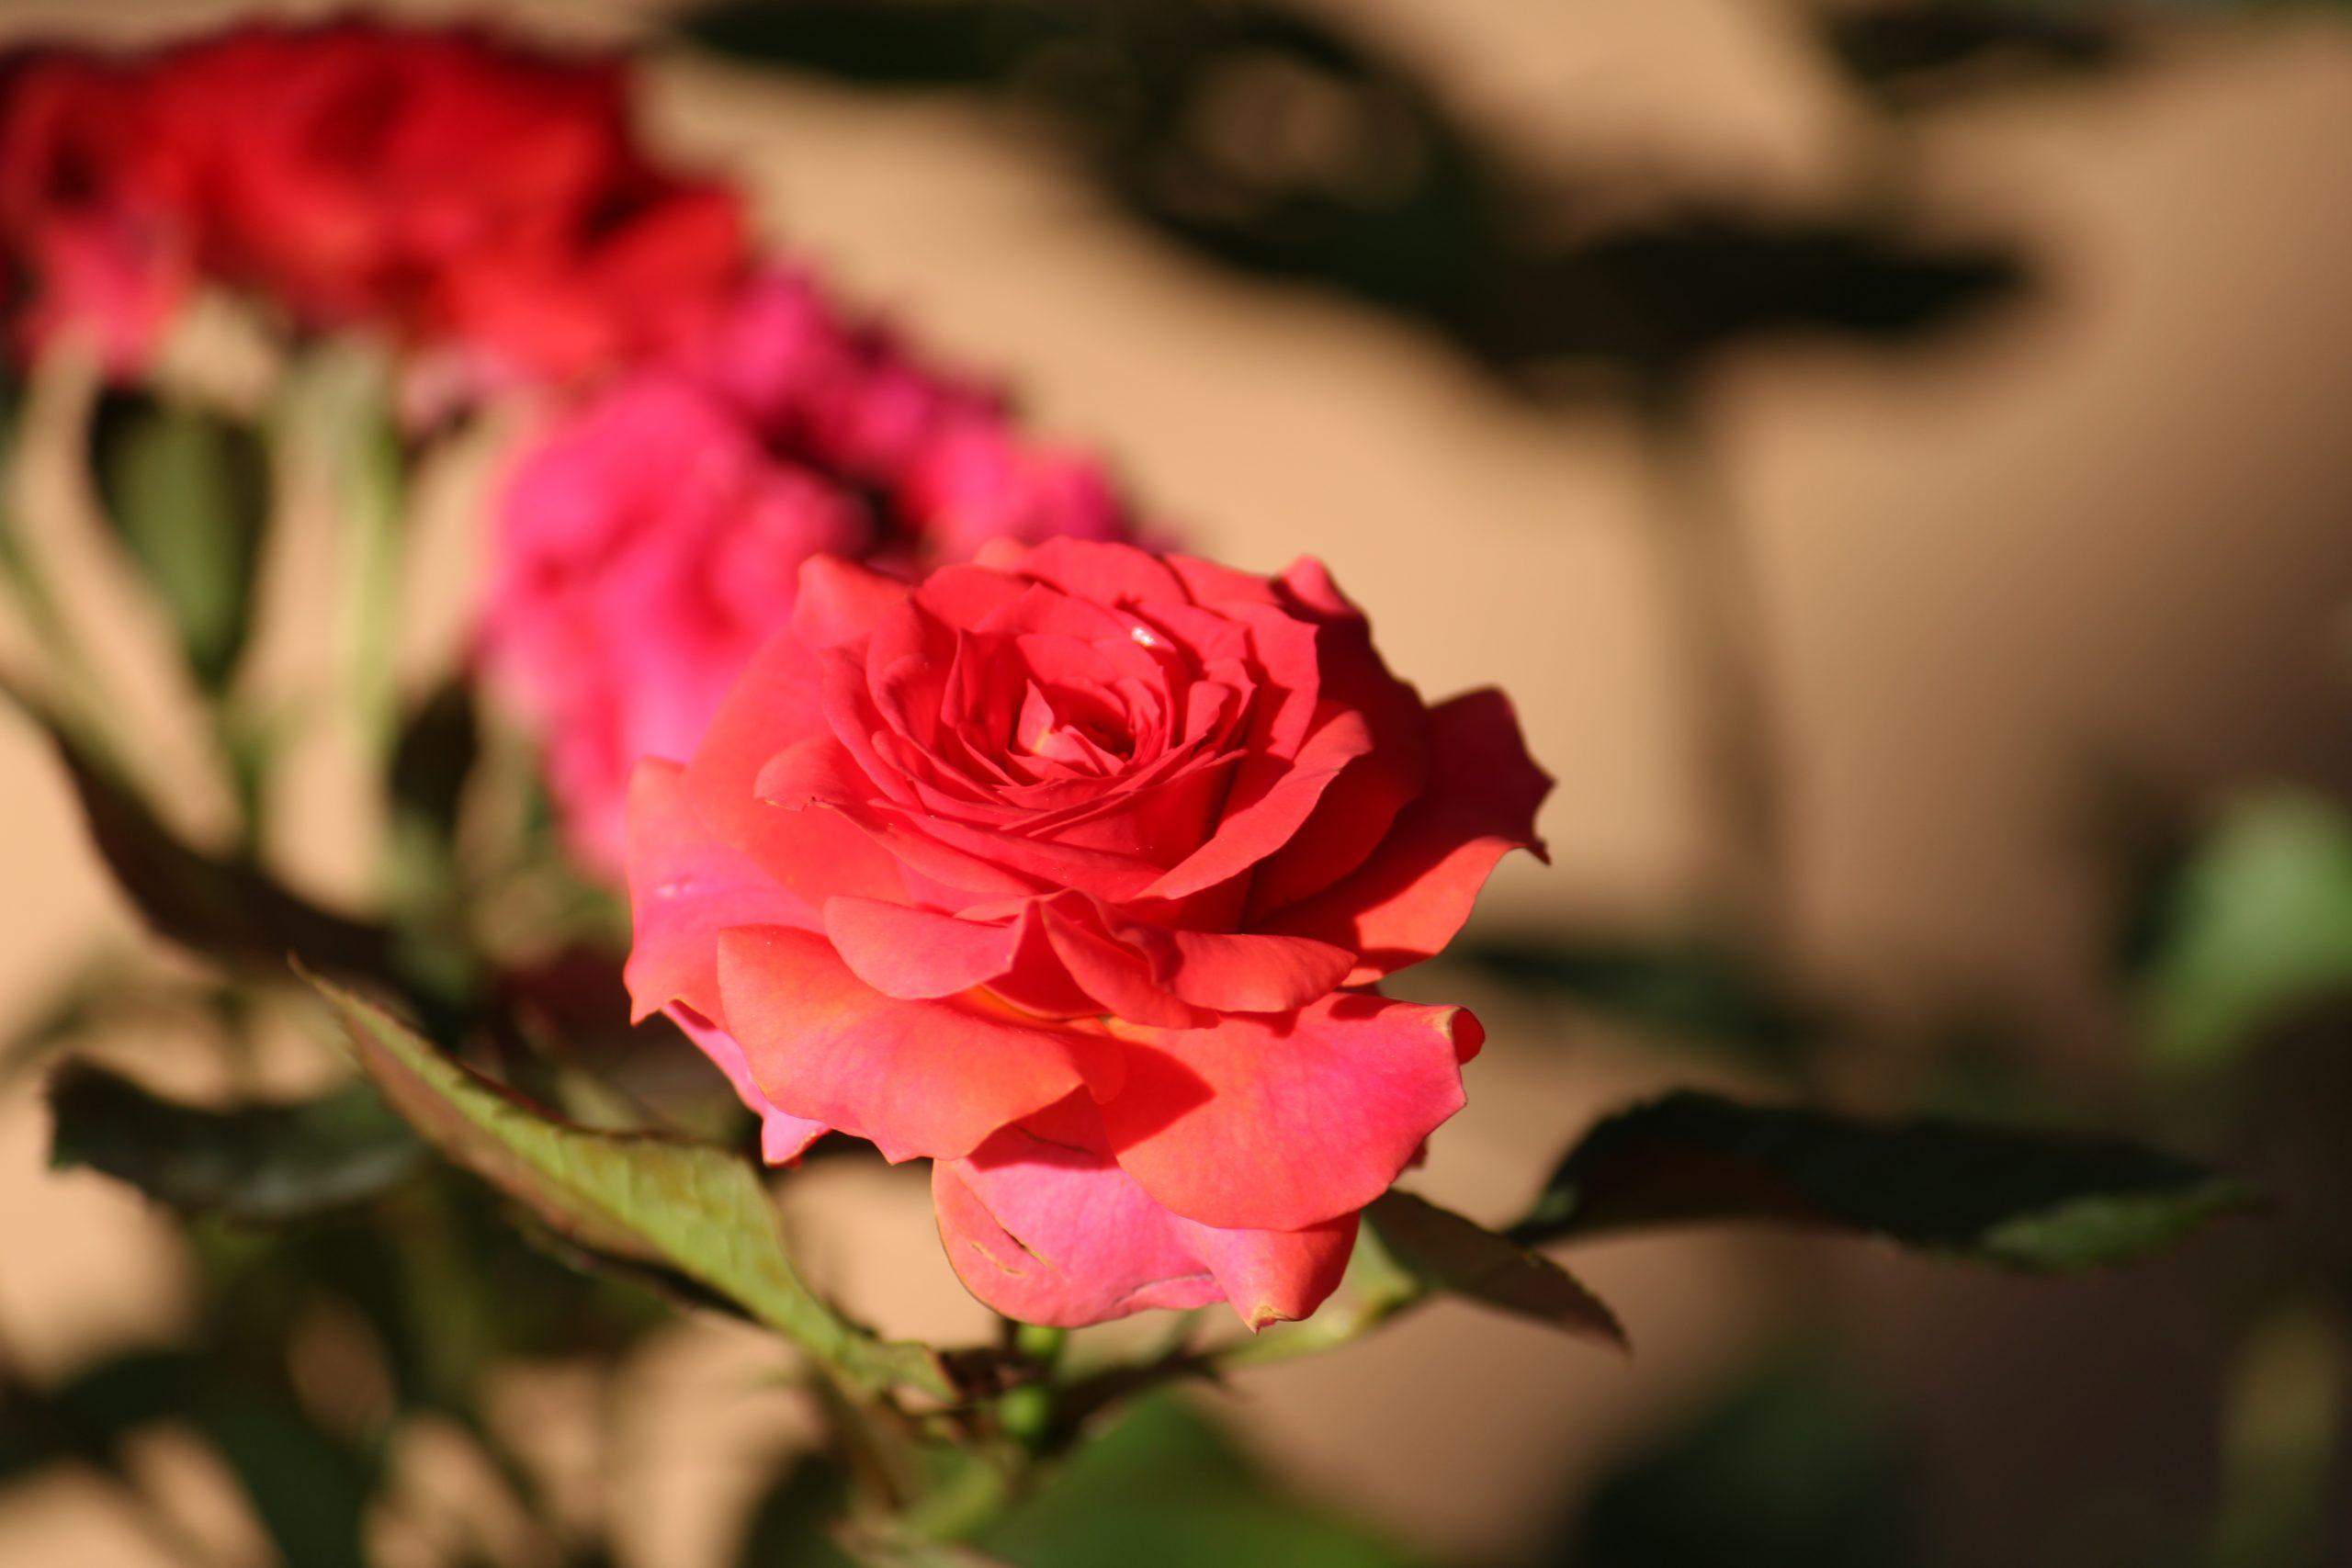 Blooming Red Rose